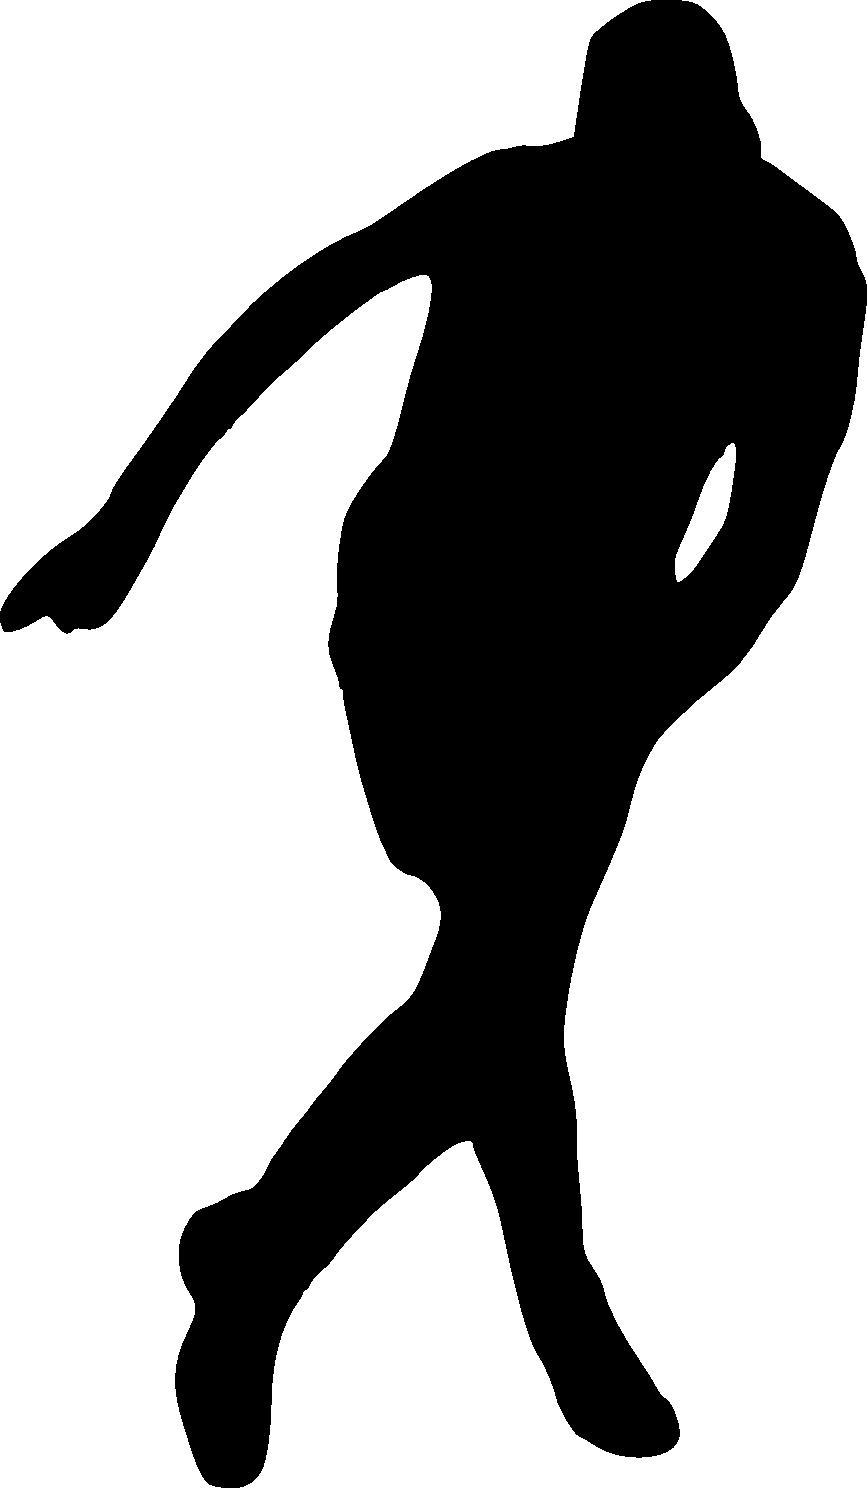 Football player silhouette clipart jpg library 24 Football Player Silhouette (PNG Transparent)   OnlyGFX.com jpg library